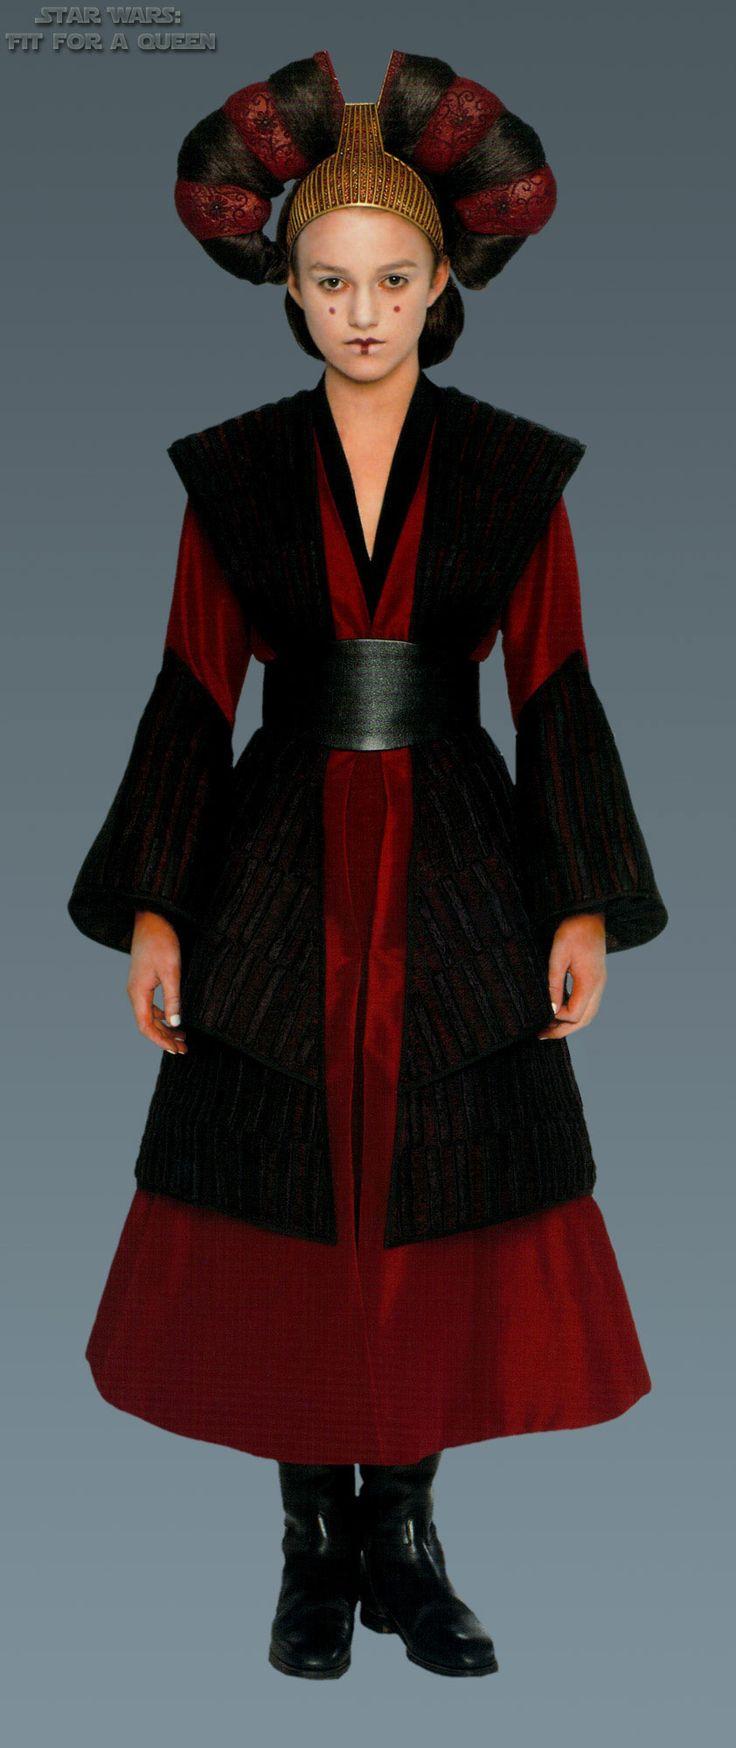 Star Wars Queen Amidala's handmaiden Sabe's Battle Dress - Front view